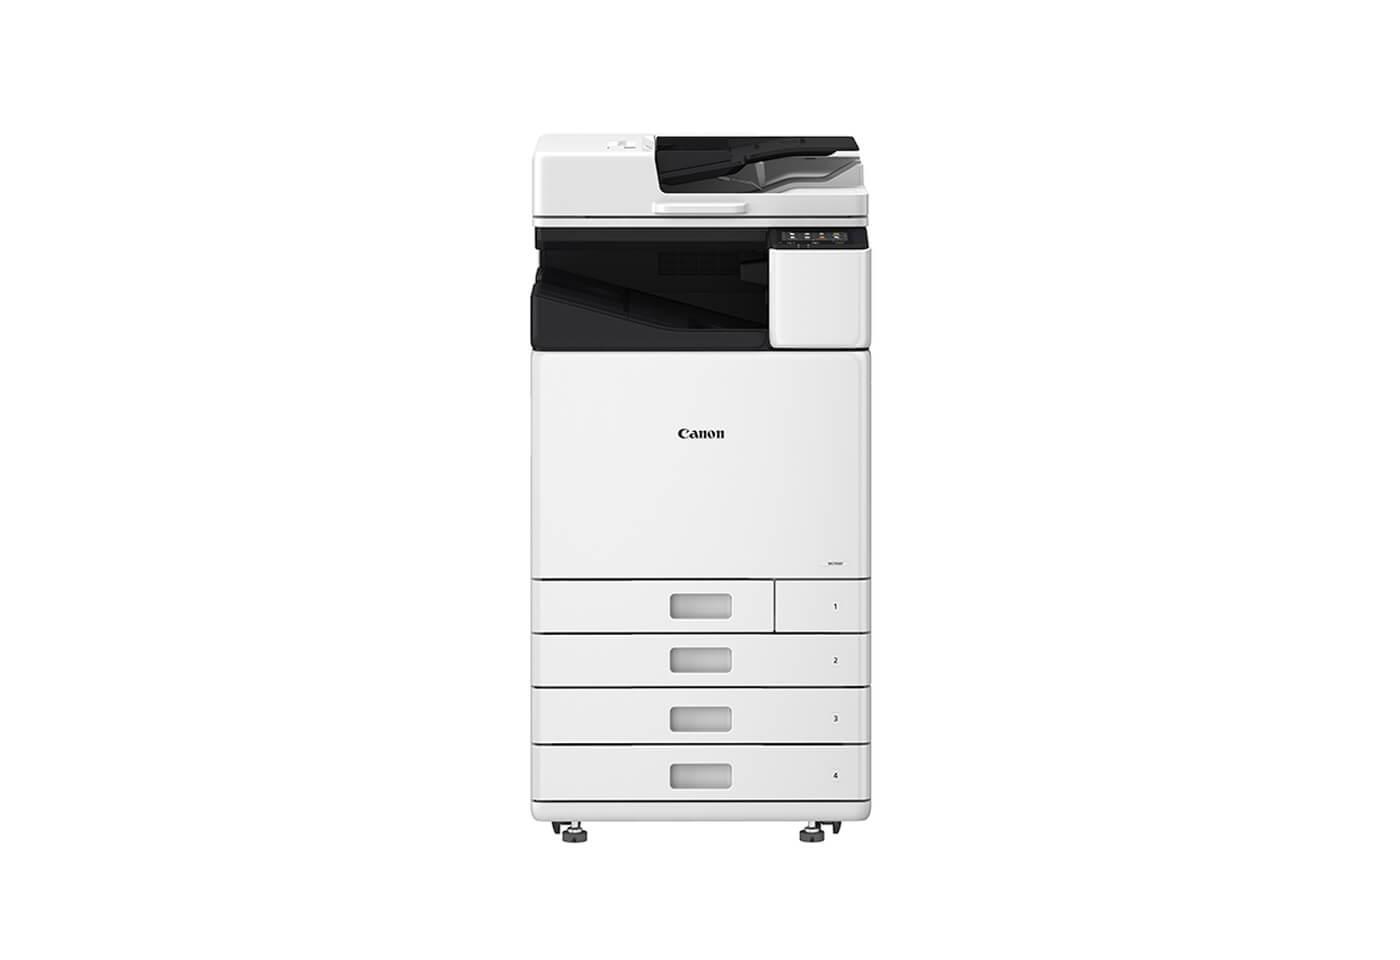 Product image of WG7000 Printer